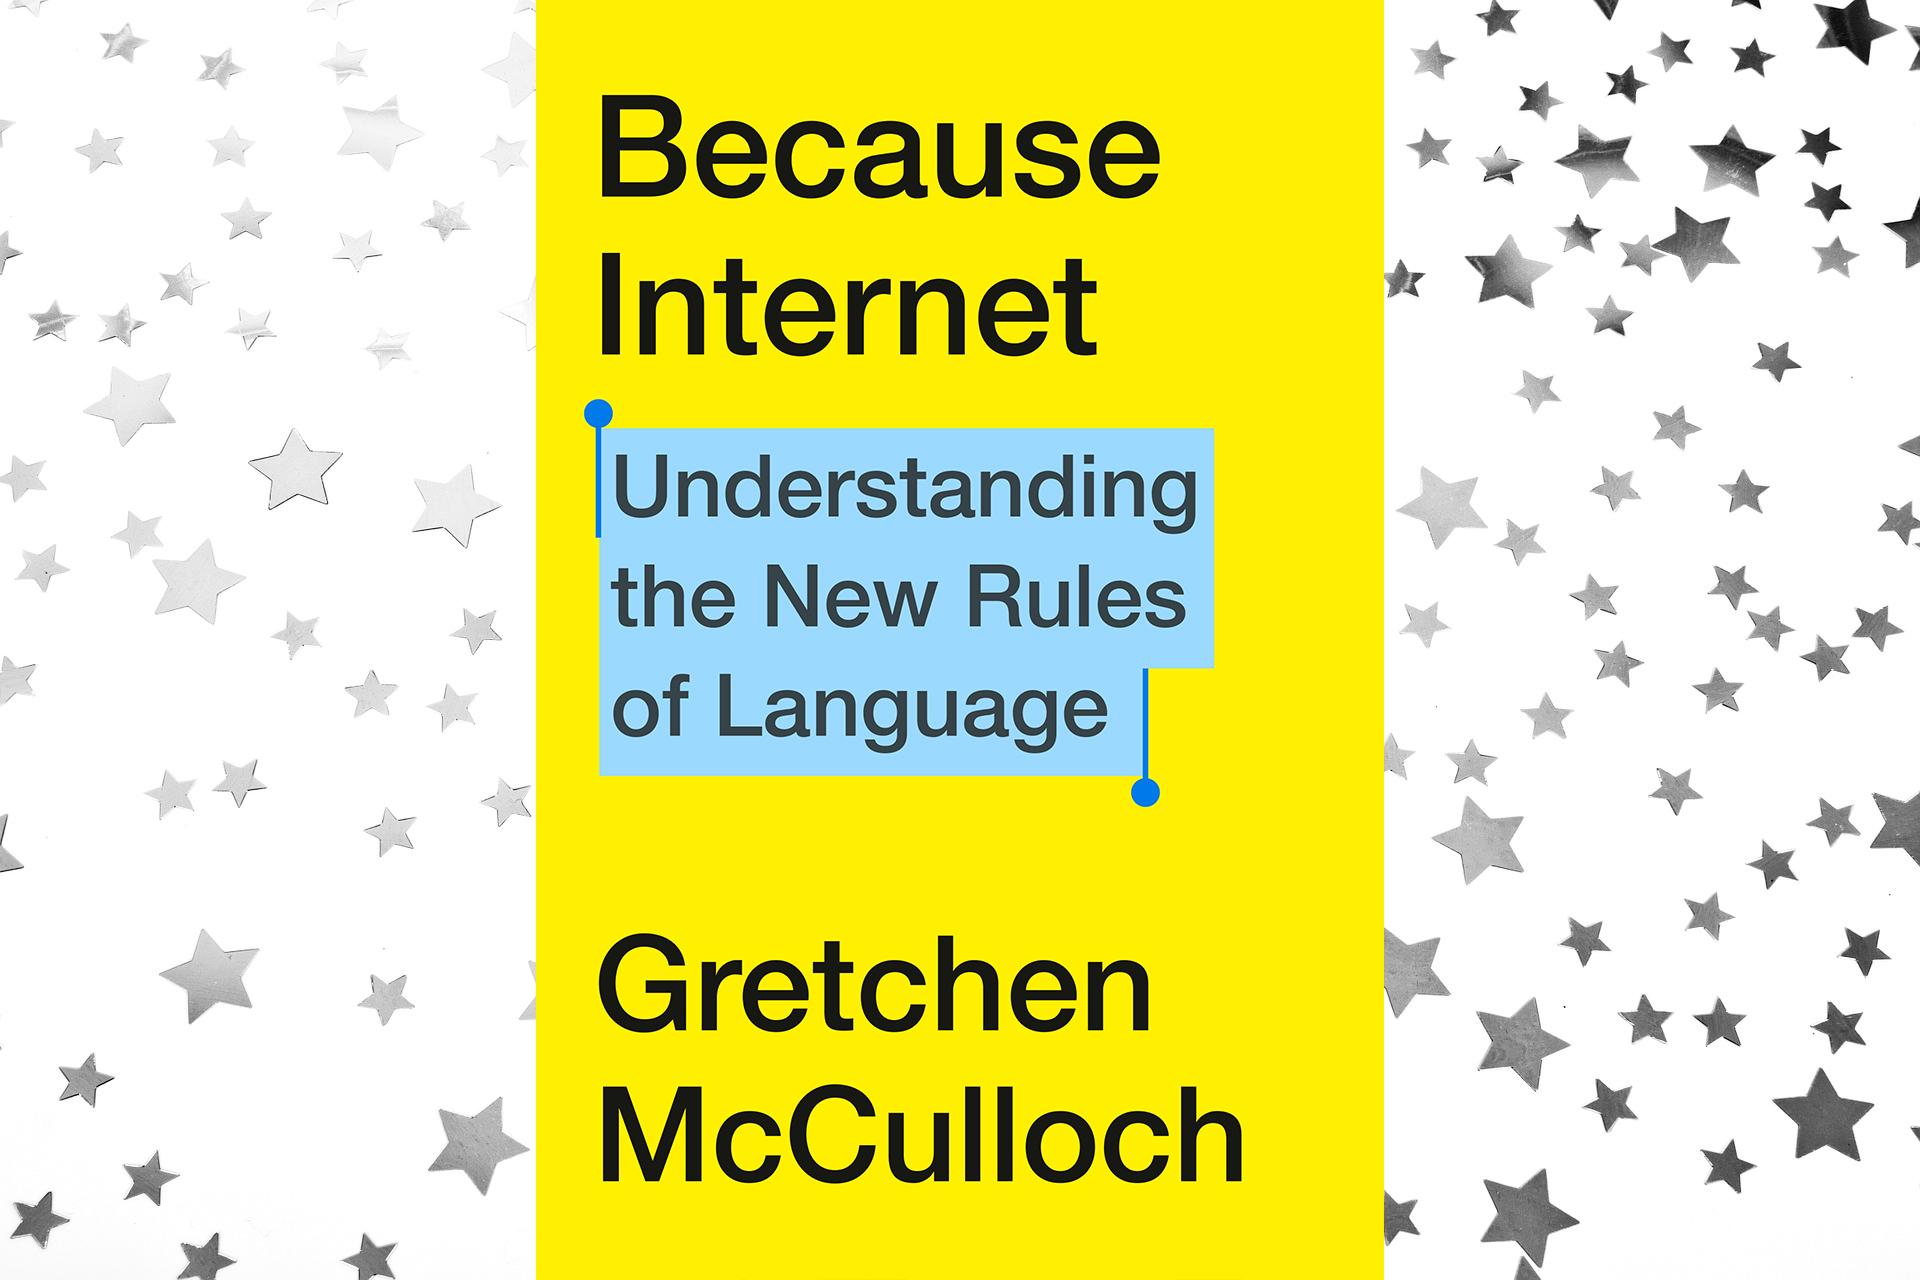 Gretchen McCulloch's book,  Because Internet